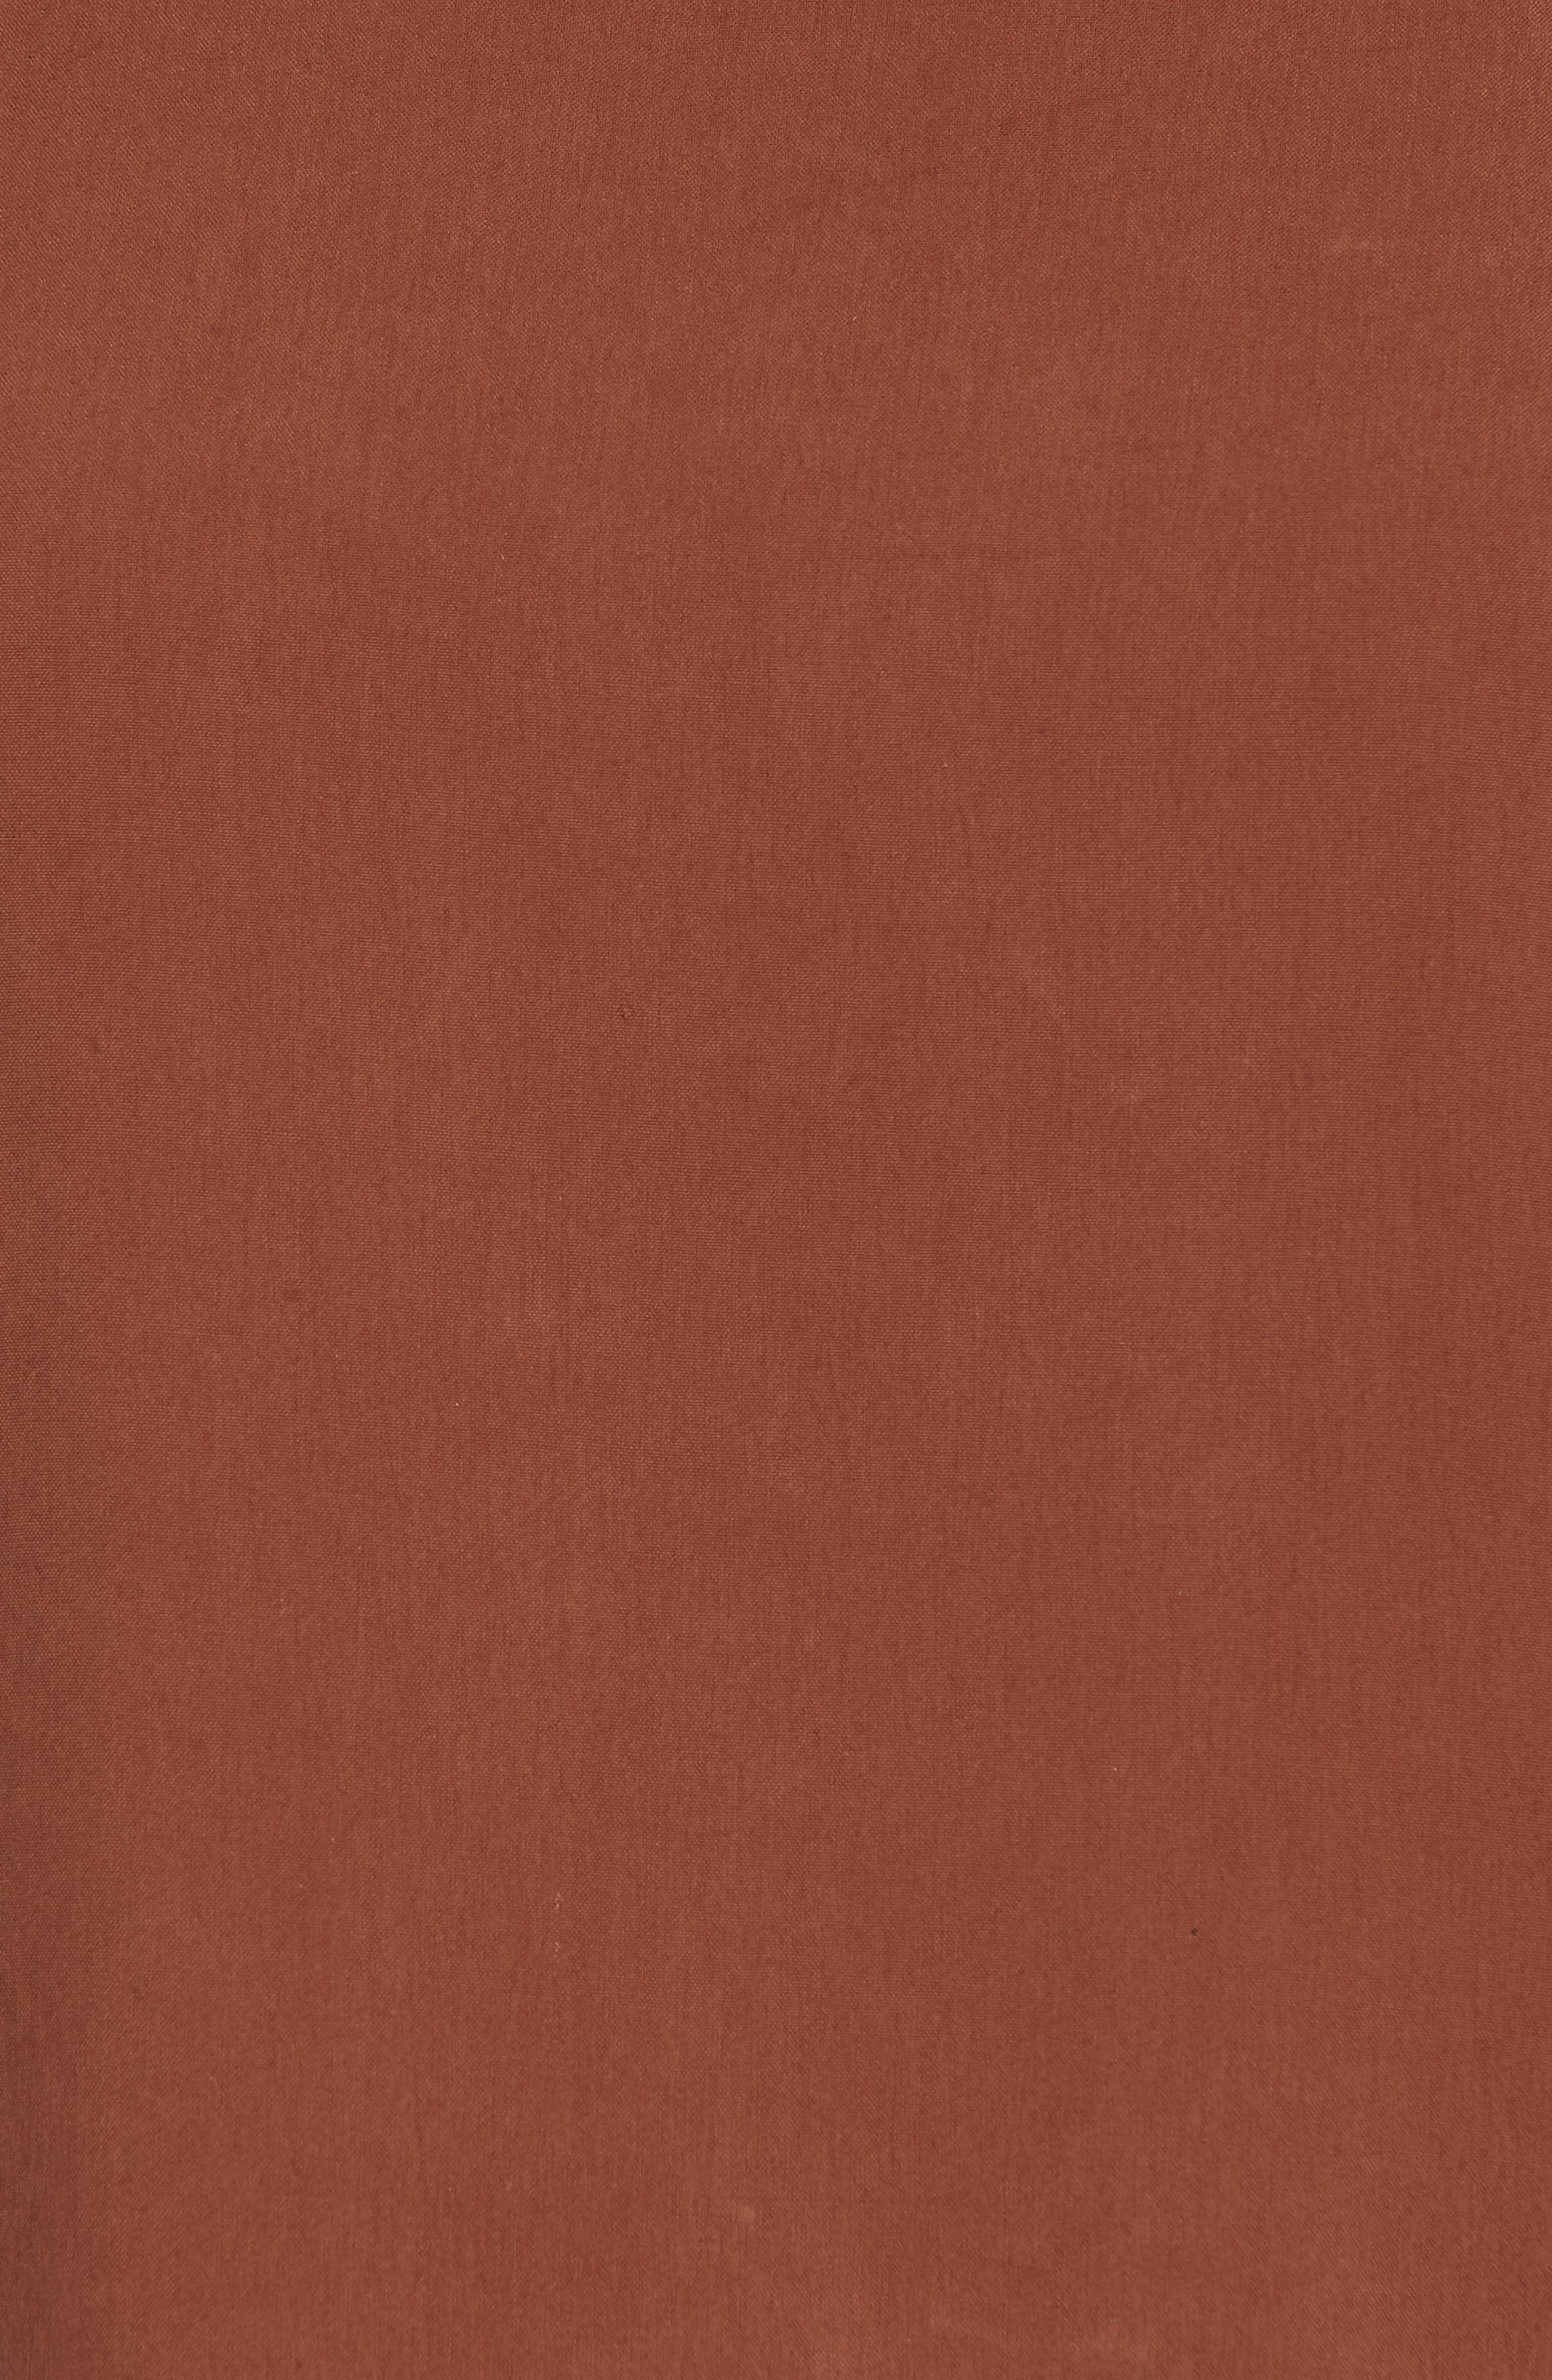 Contrast Trim Silk Top,                             Alternate thumbnail 6, color,                             242